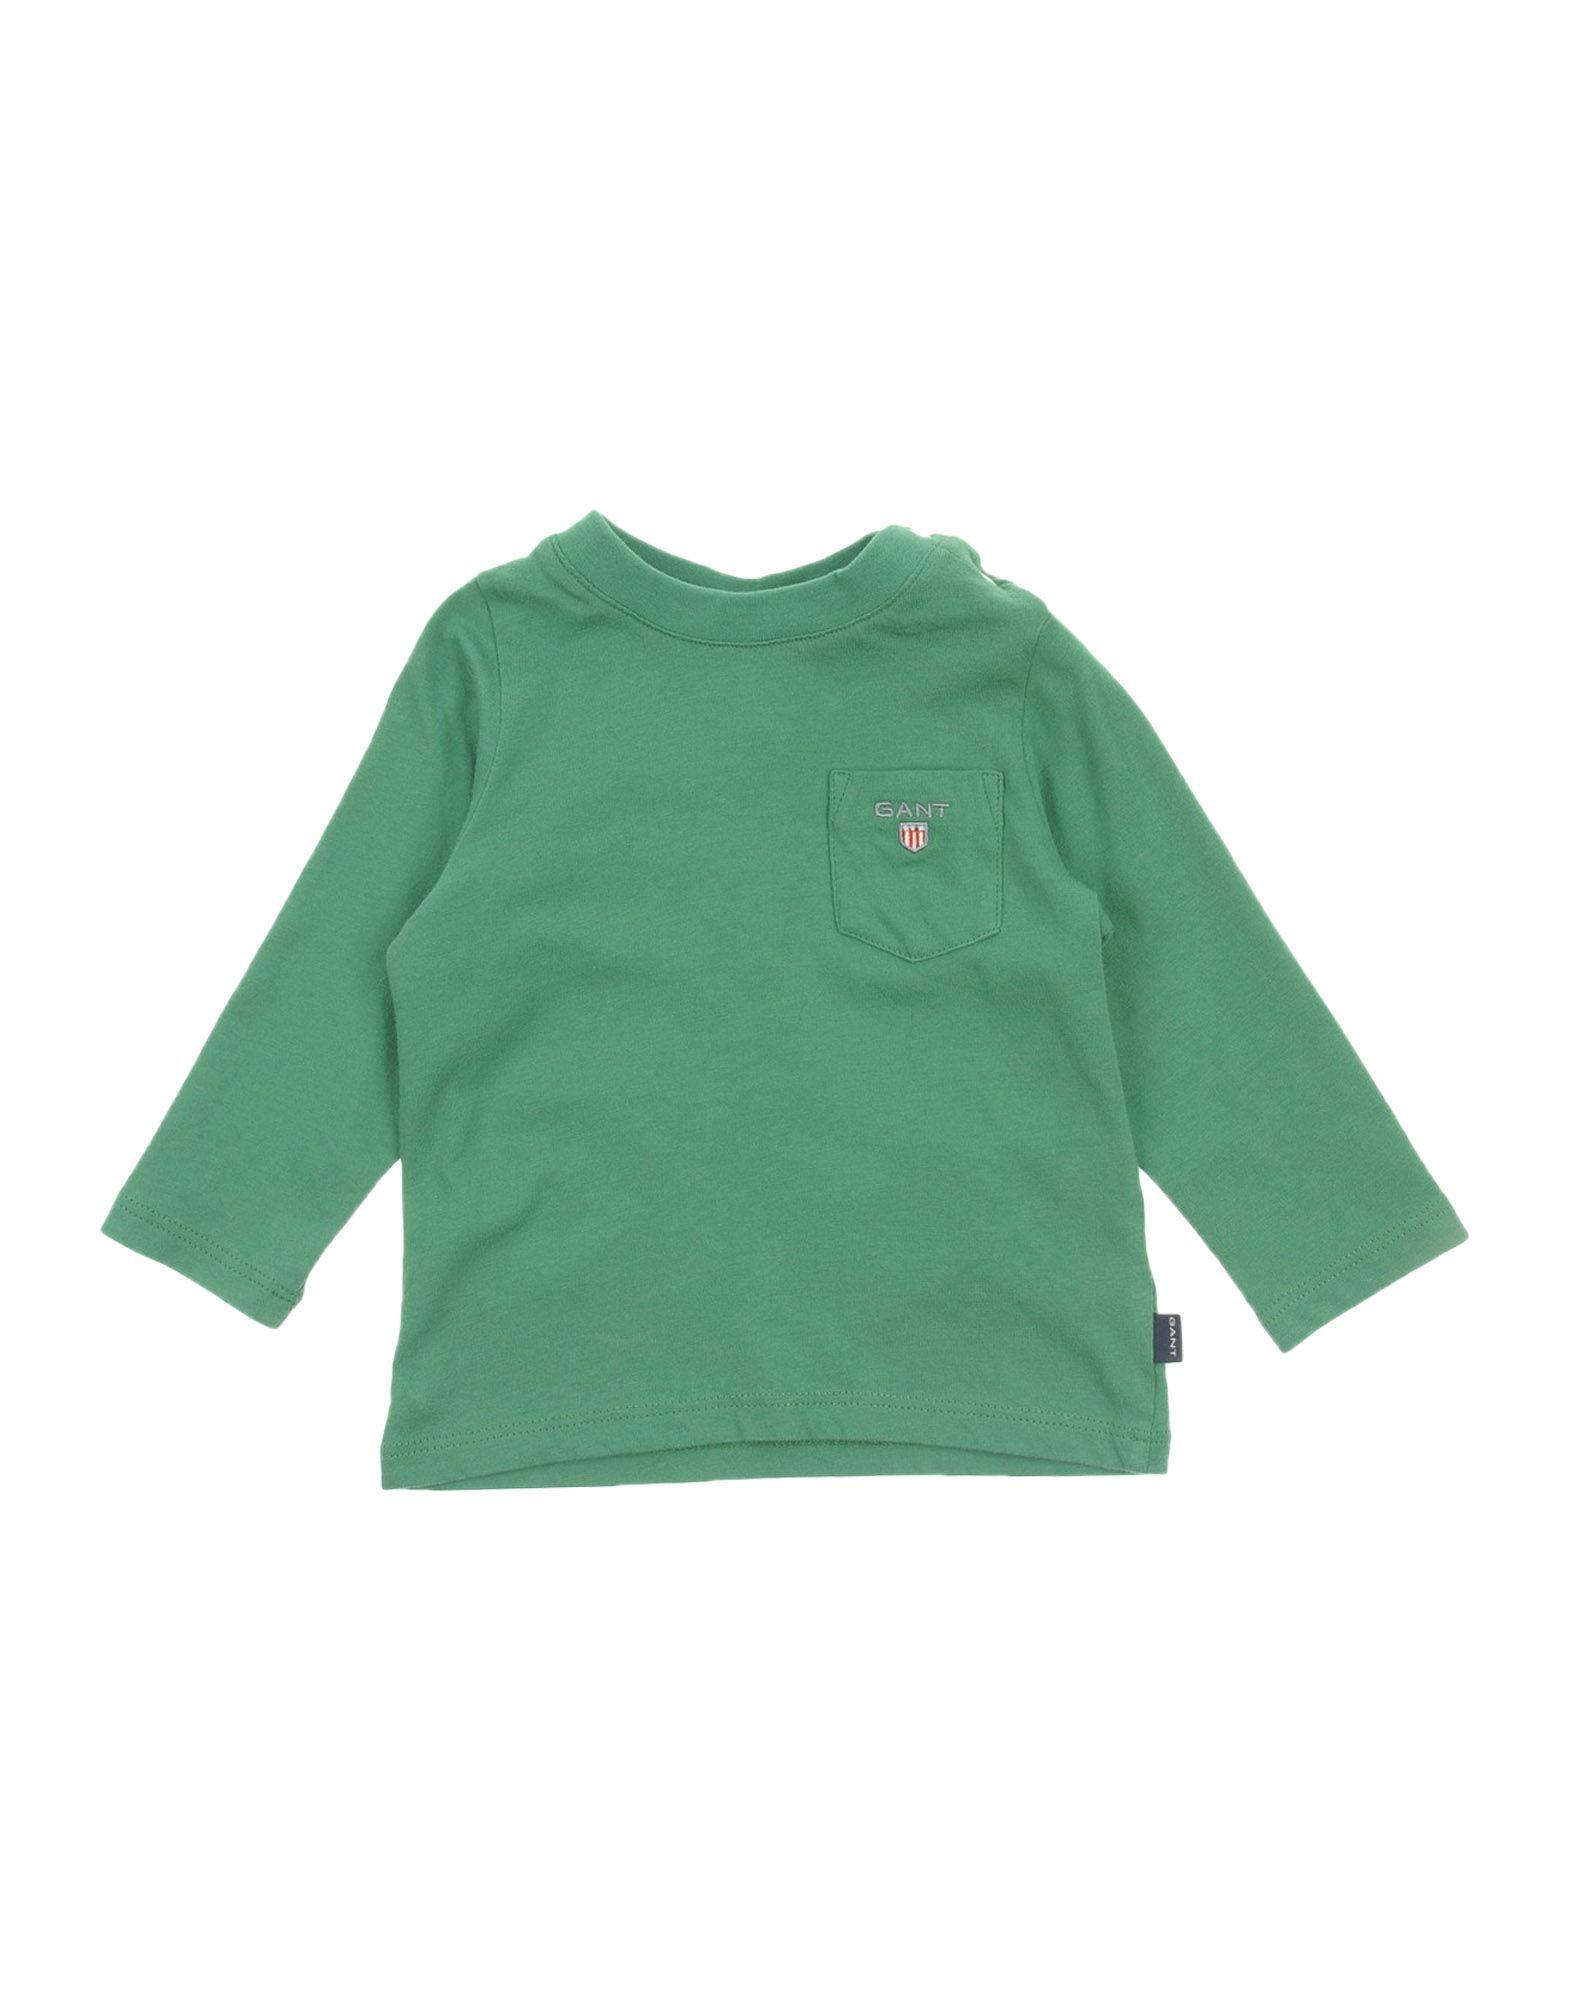 83105e1bf810 Παιδικά ρούχα Gant Αγόρι 0-24 μηνών στο YOOX